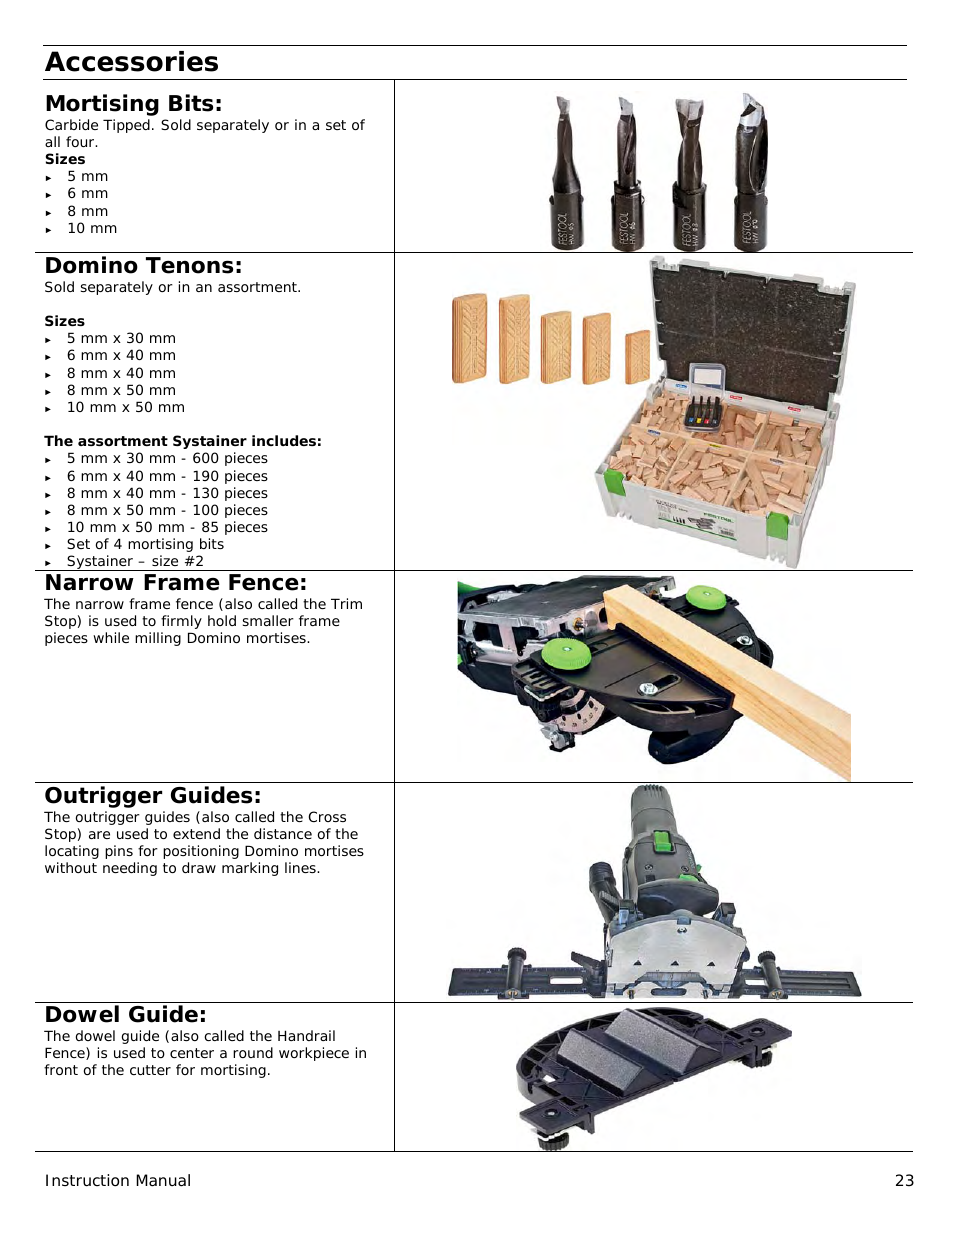 Festool Domino Df 500 Manual Page 23 Festool Festool Tools Domino